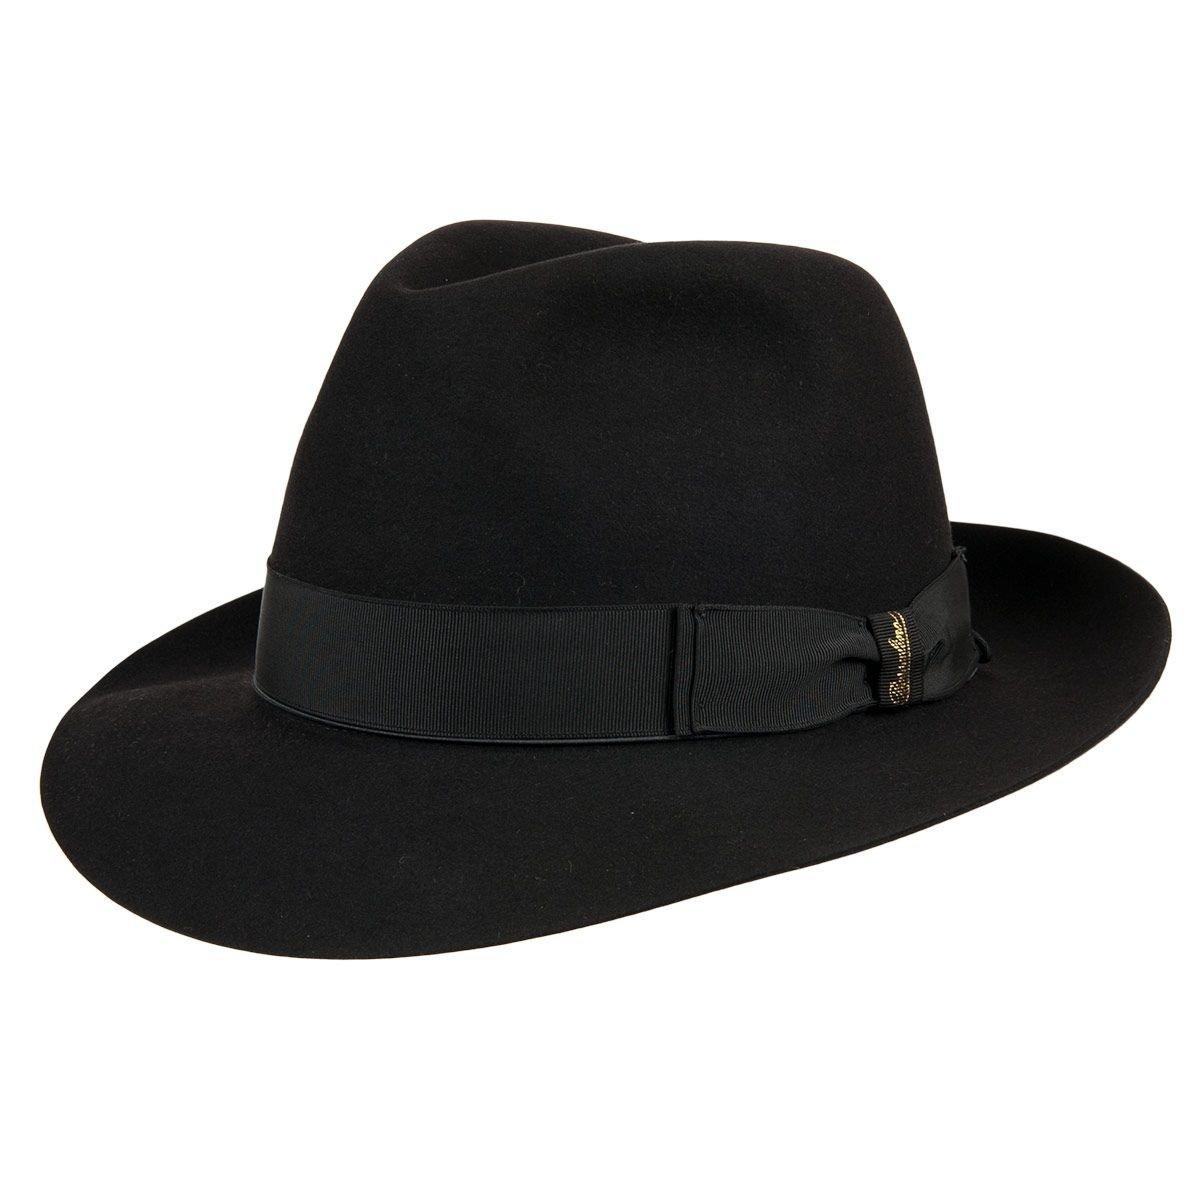 Borsalino hat with original hatbox